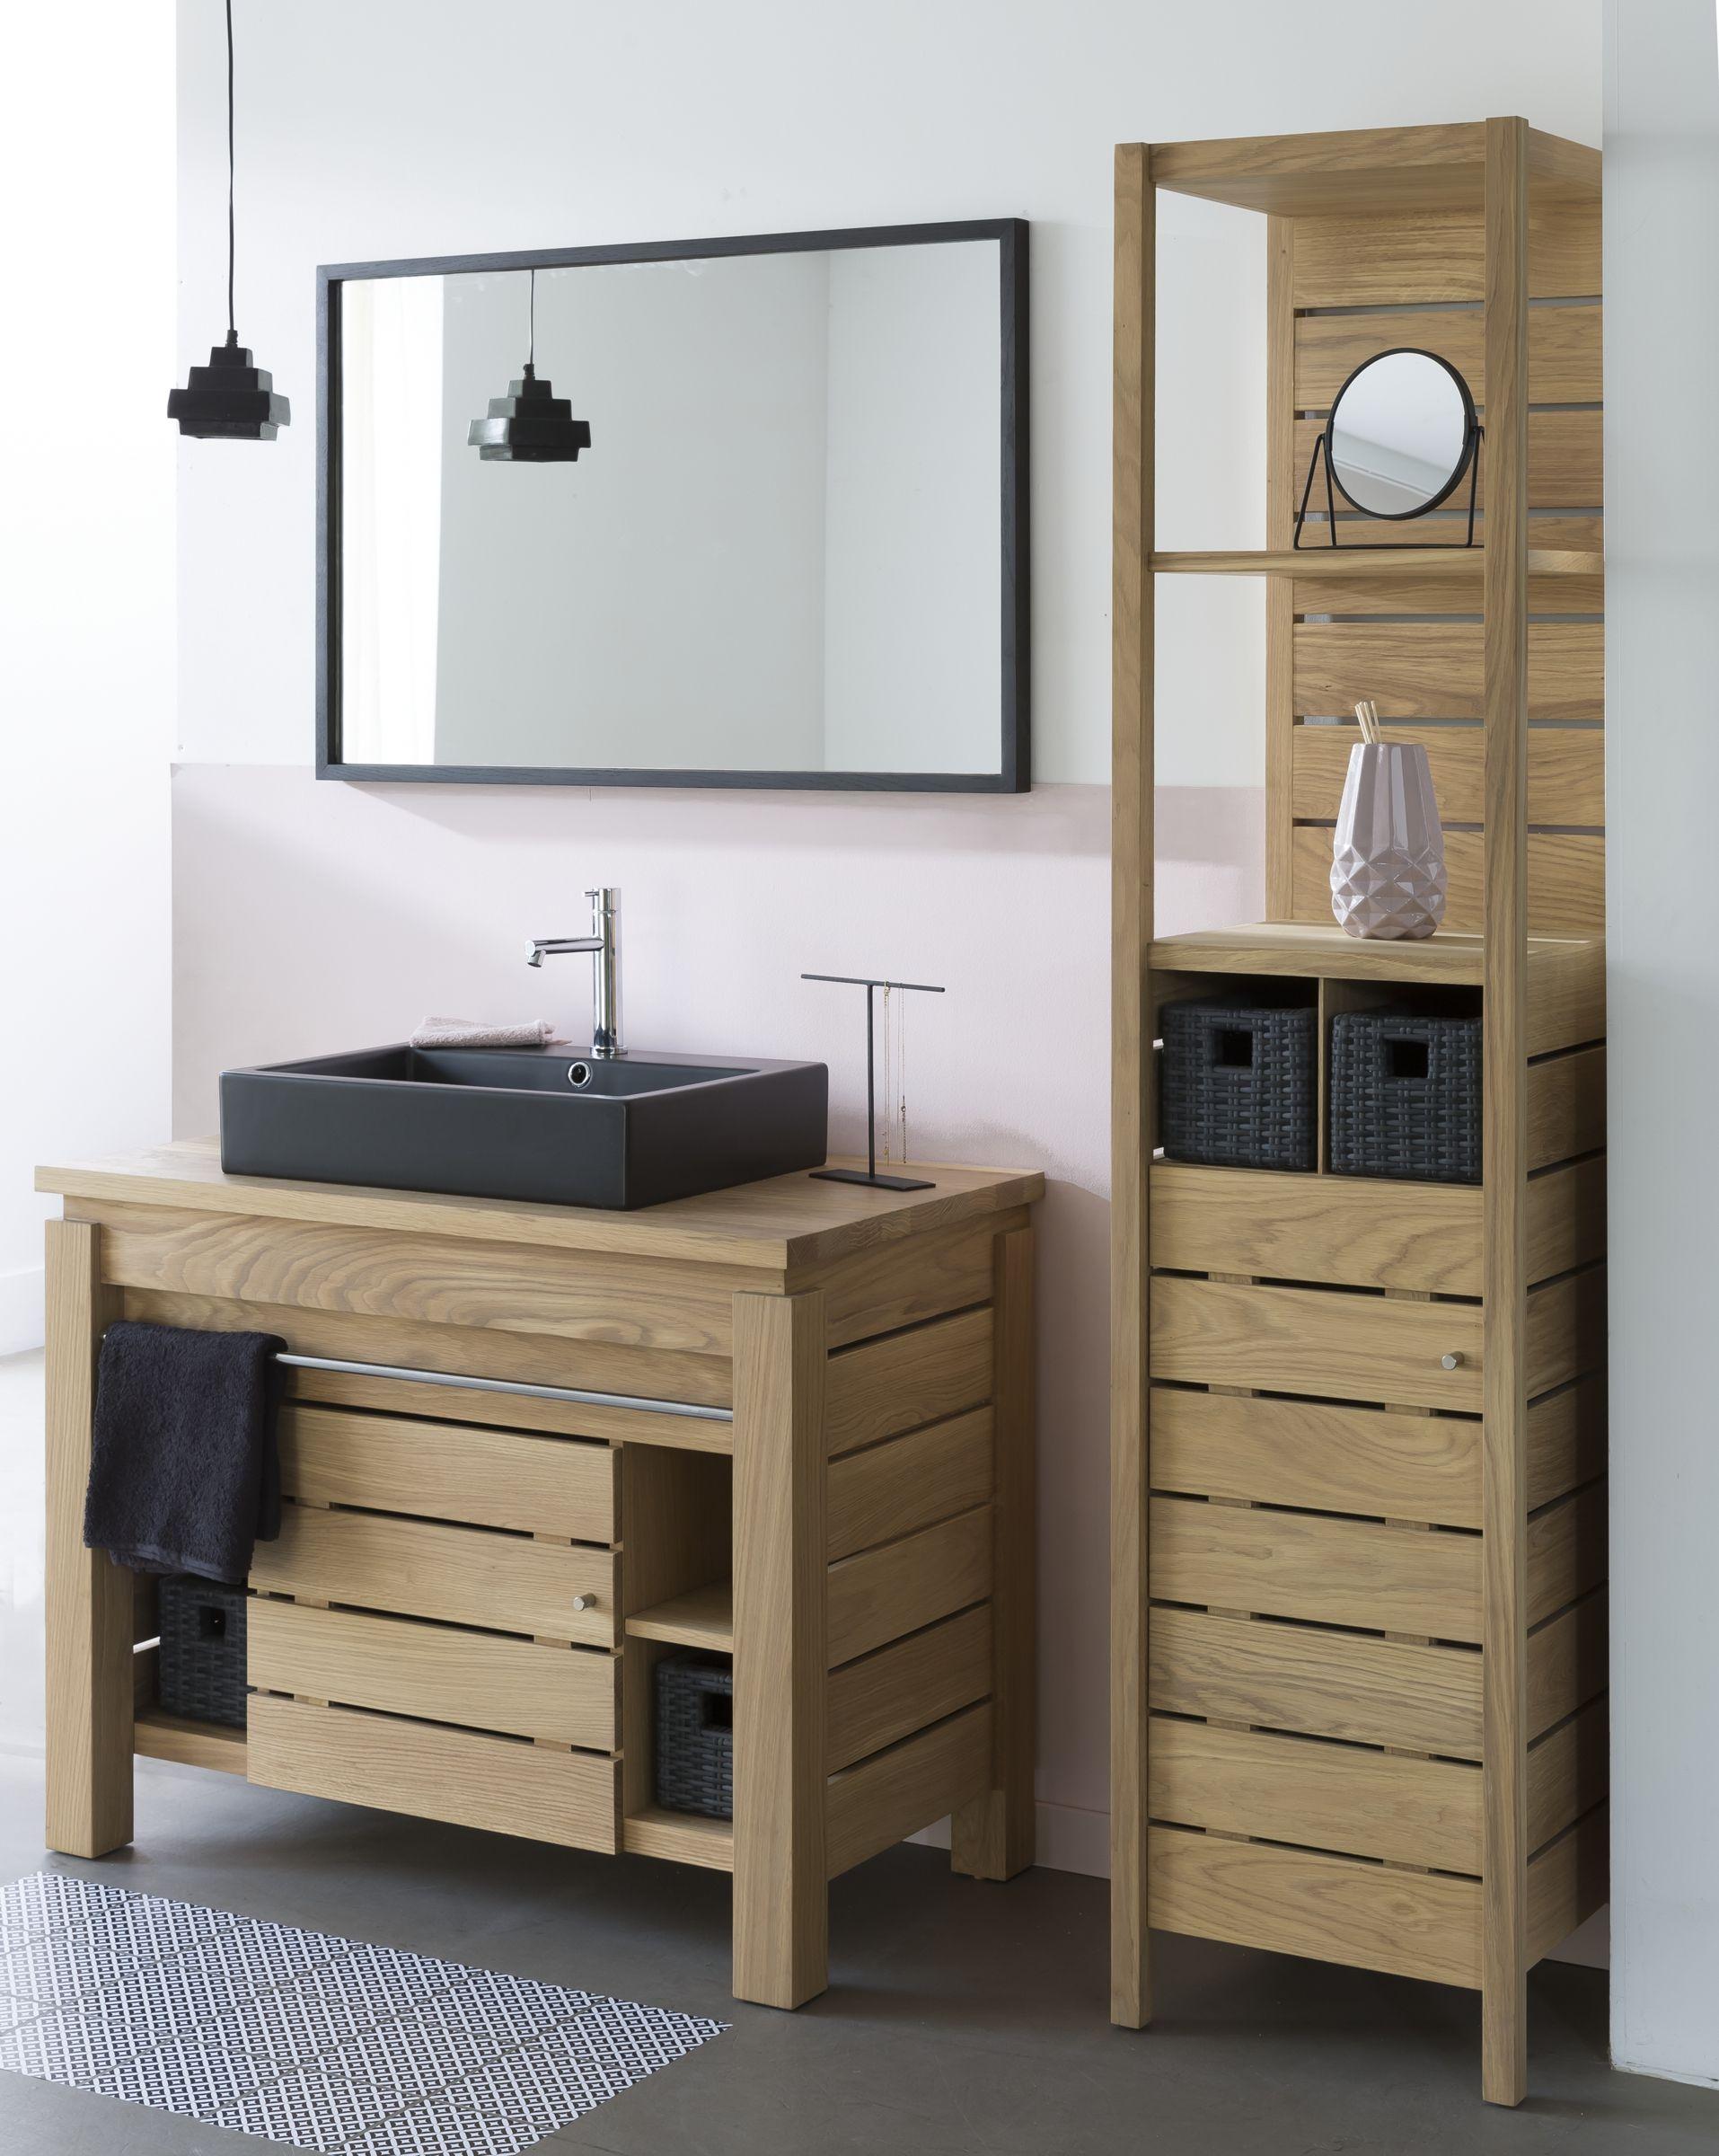 origin By Line Art Solid Teak Bathroom Vanity with Column Line